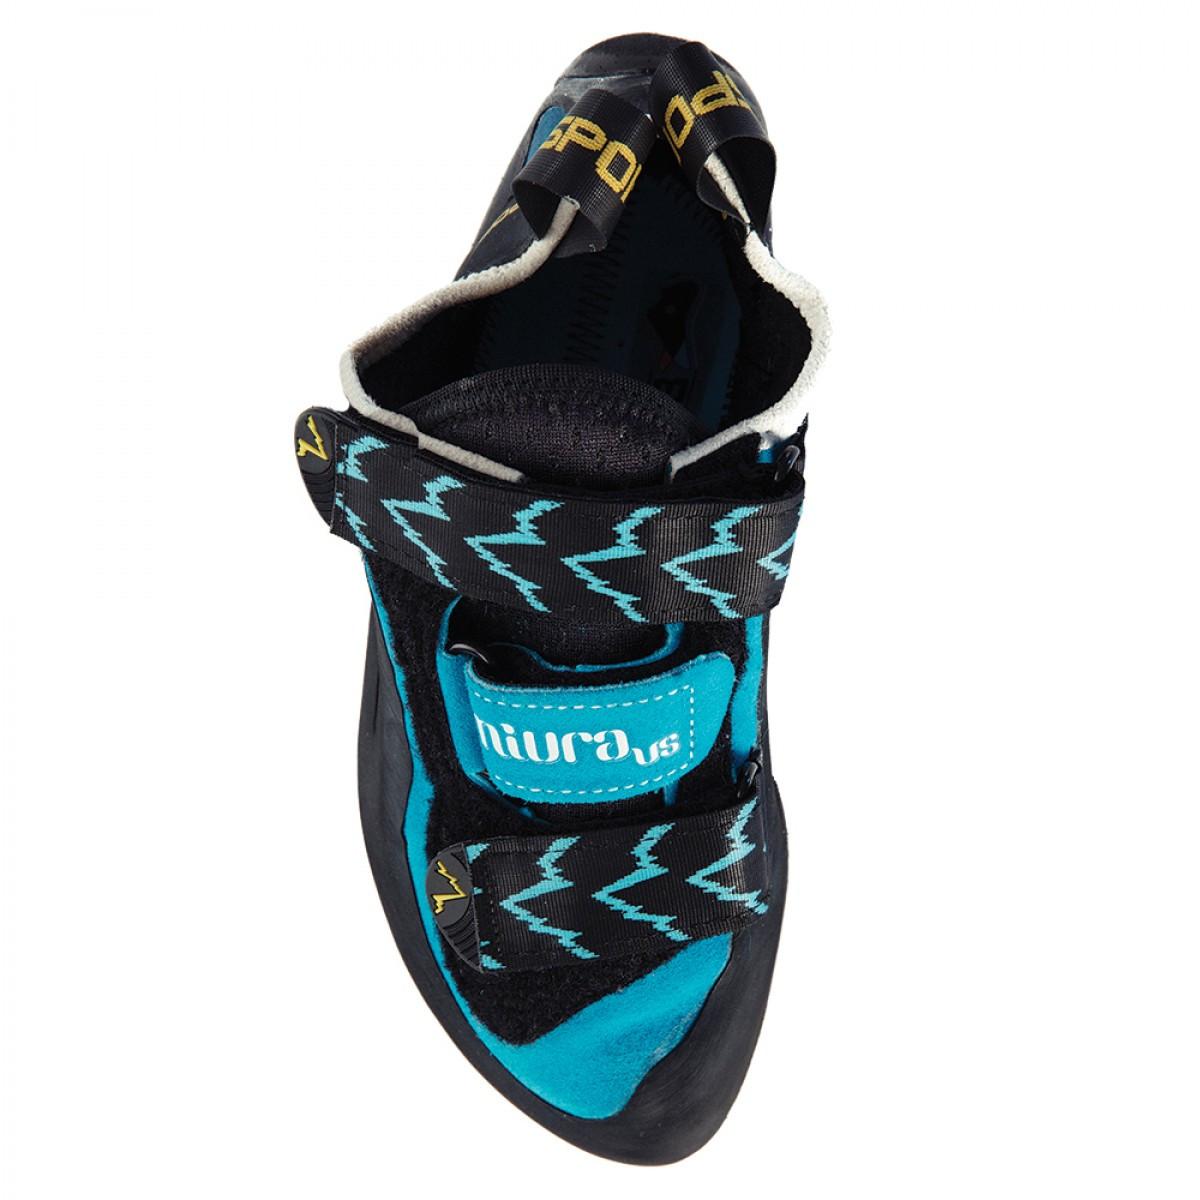 Miura Vs Climbing Shoe Review